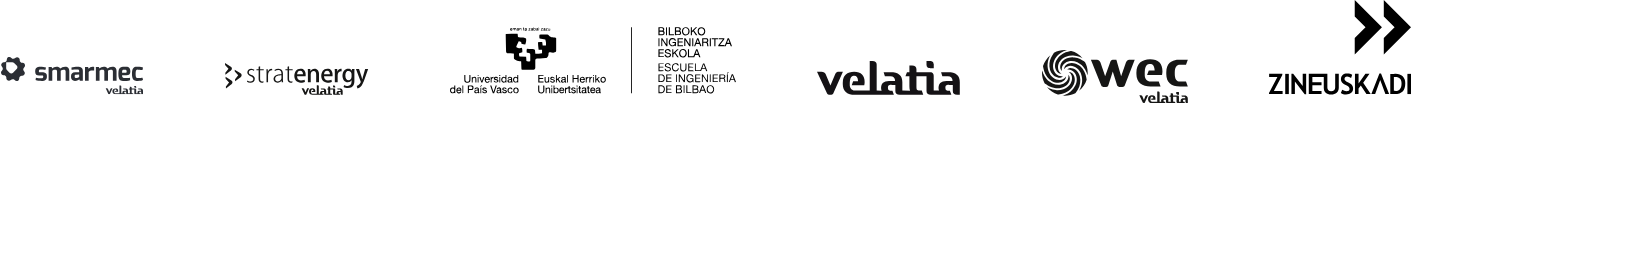 Varios Logos Smarmec Stratenergy UPV EHU Velatia Wec Zineuskadi